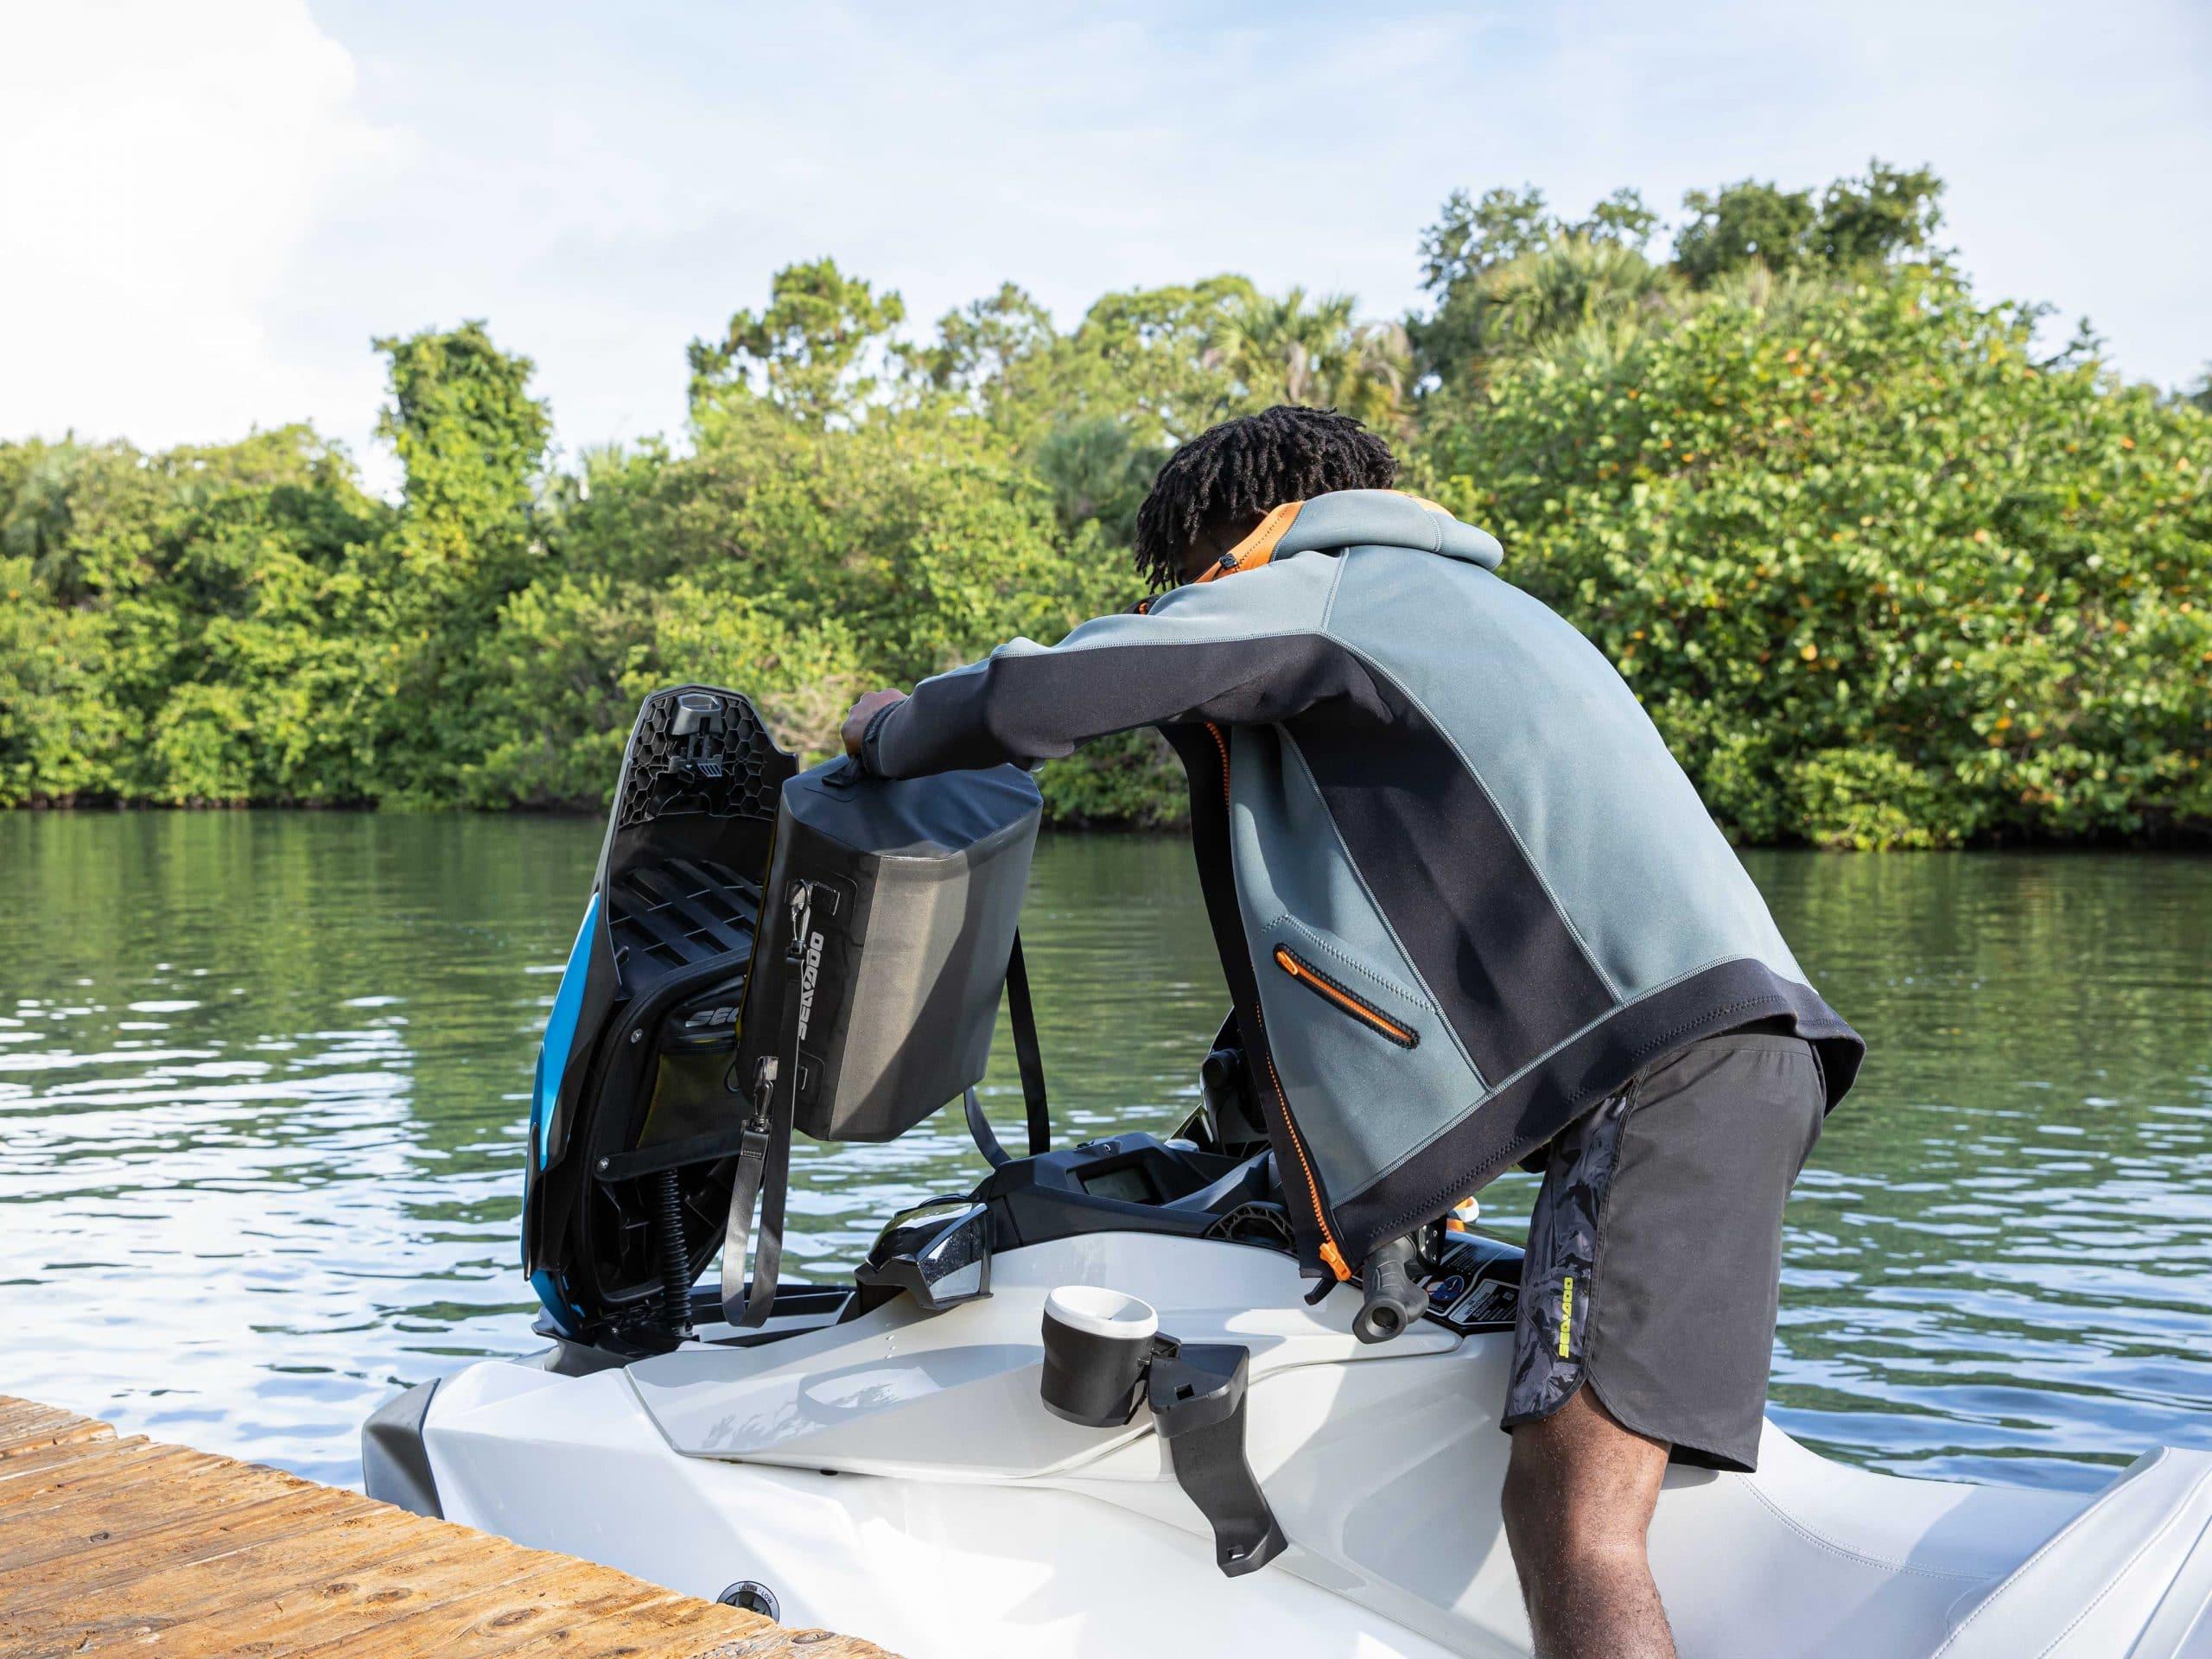 Le rangement avant du Sea-Doo FishPro Scout. Source: https://www.sea-doo.com/ca/fr/modeles/sport-fishing/fish-pro-scout.html